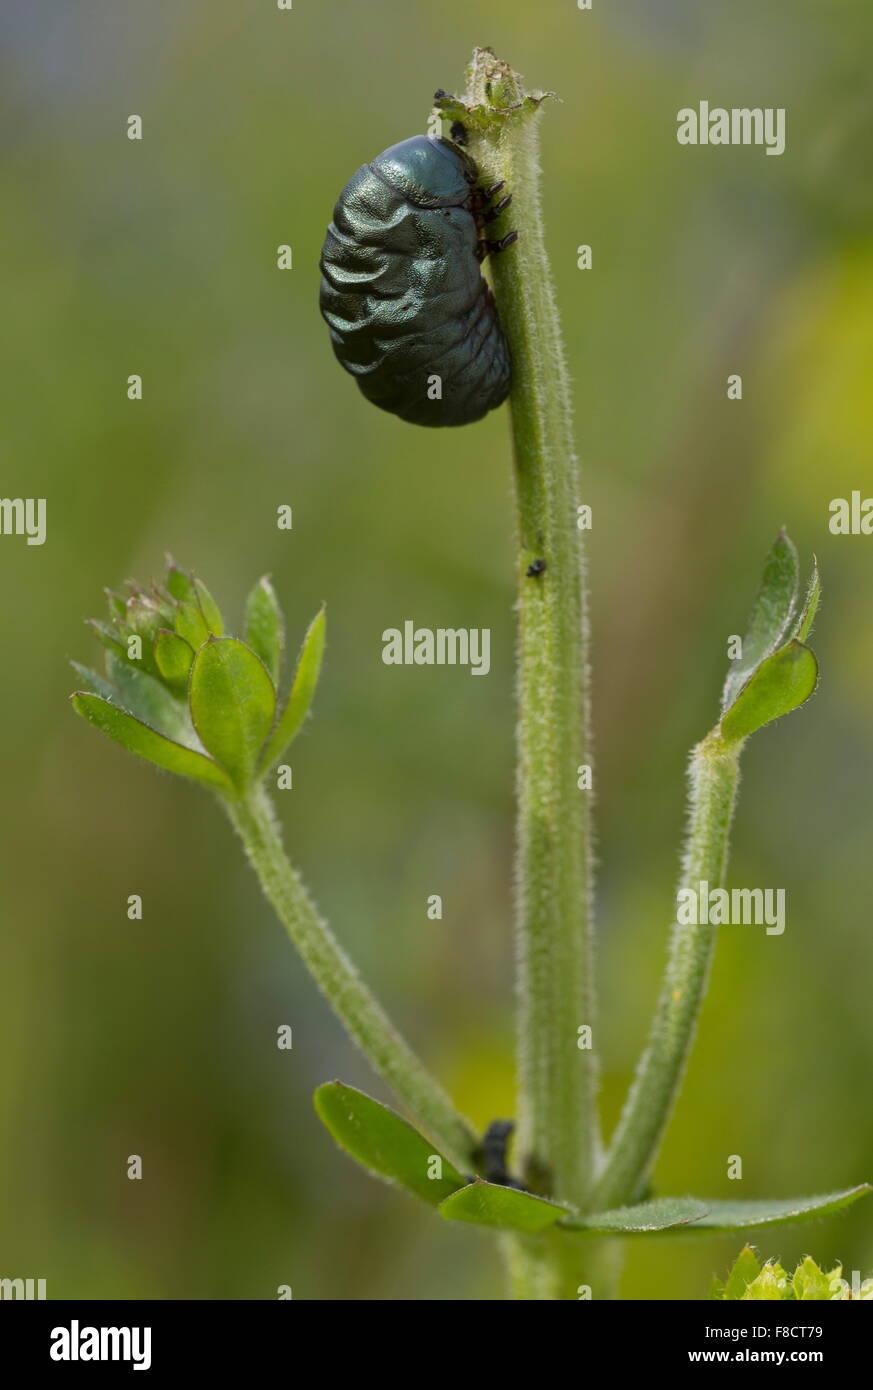 Larva of bloody-nosed beetle, Timarcha tenebricosa, feeding on hedge bedstraw. Coastal - Stock Image